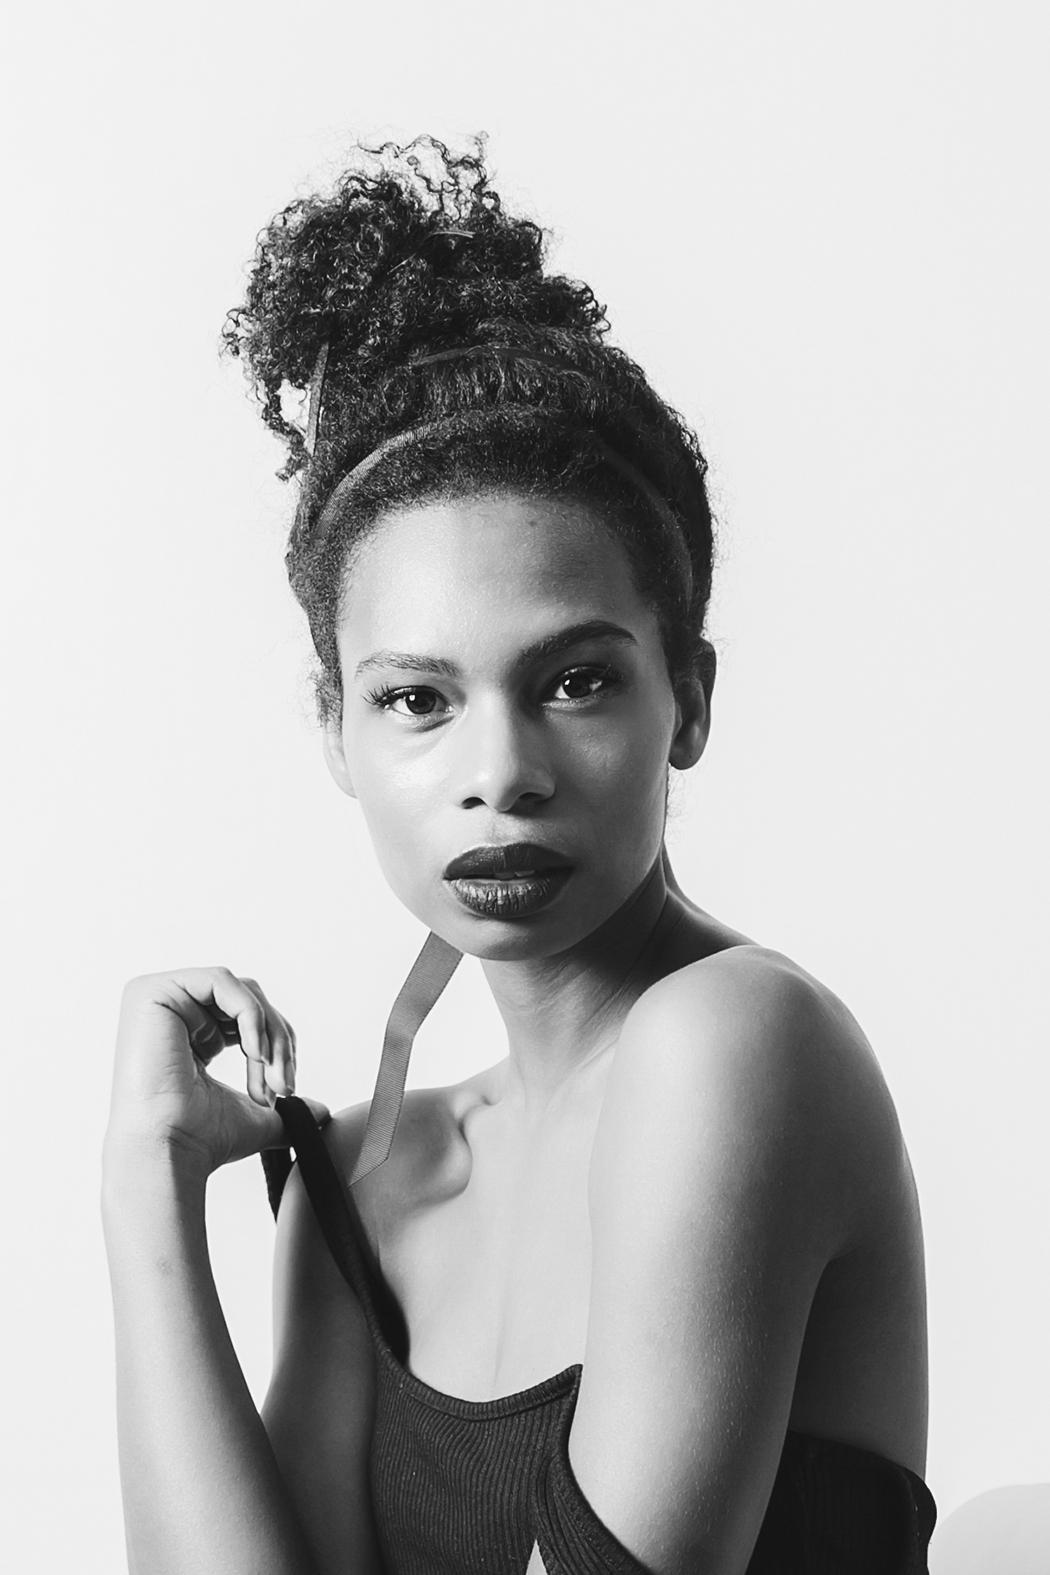 Photography Jennifer Coffey, Model Kirsten Luiz , Hair Maritza Buelvas for Xtava.com